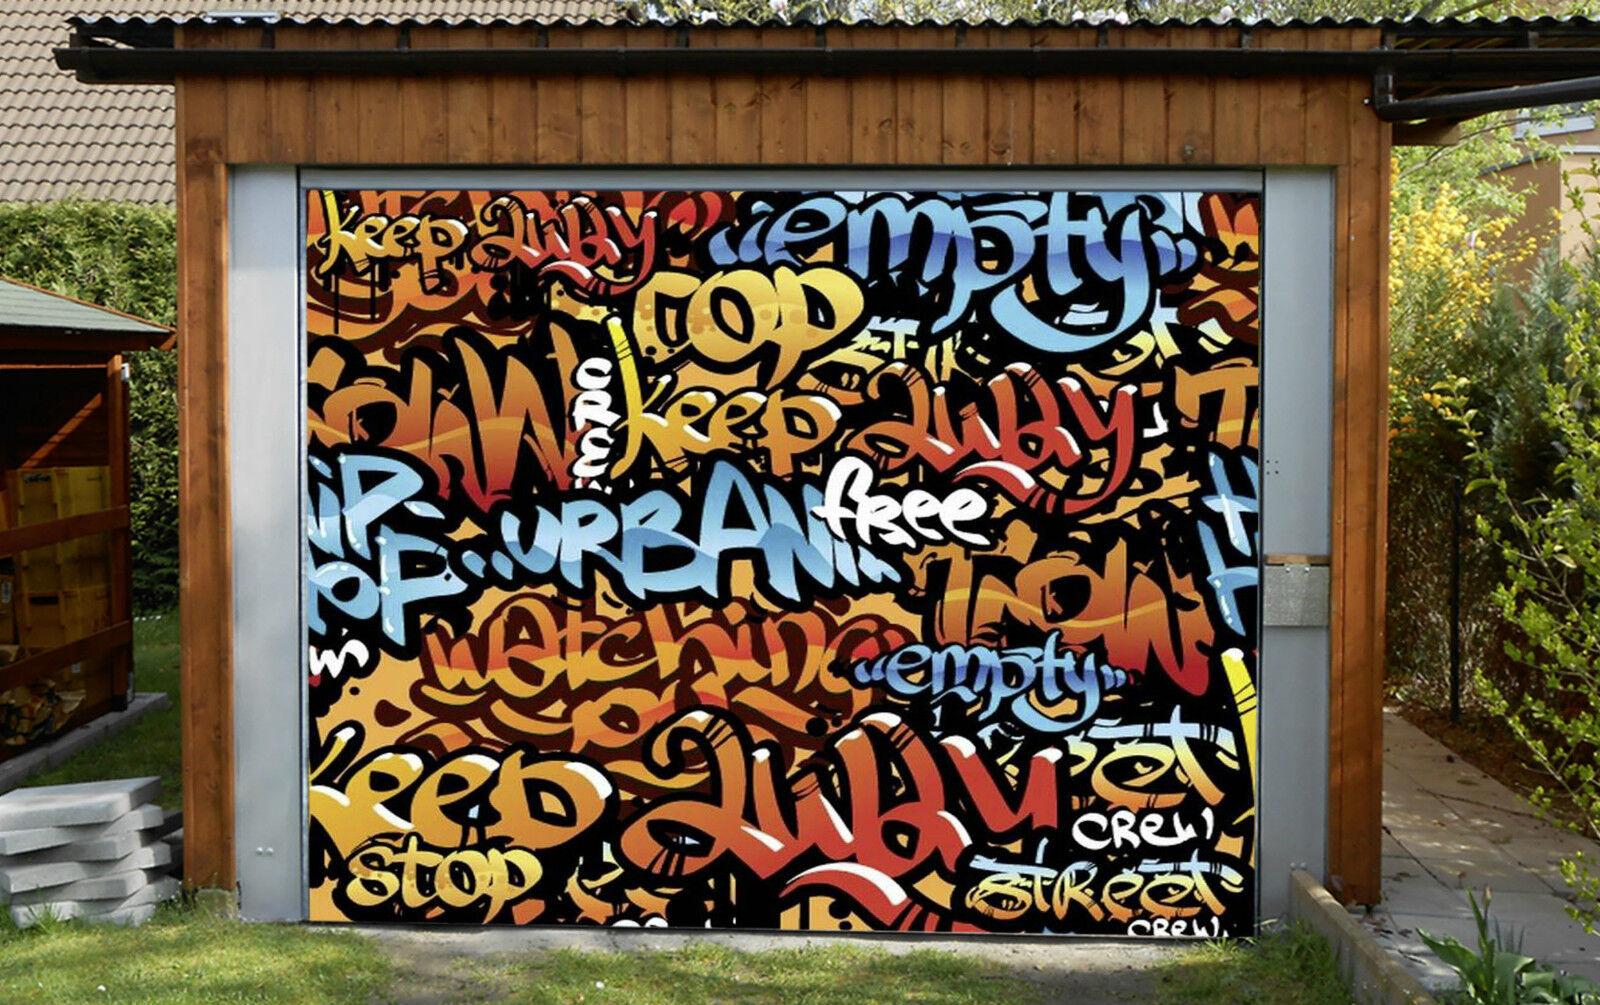 3D Graffiti Wort 7 Garage Door Murals Wall Print Decal Wall Deco AJ WALLPAPER DE